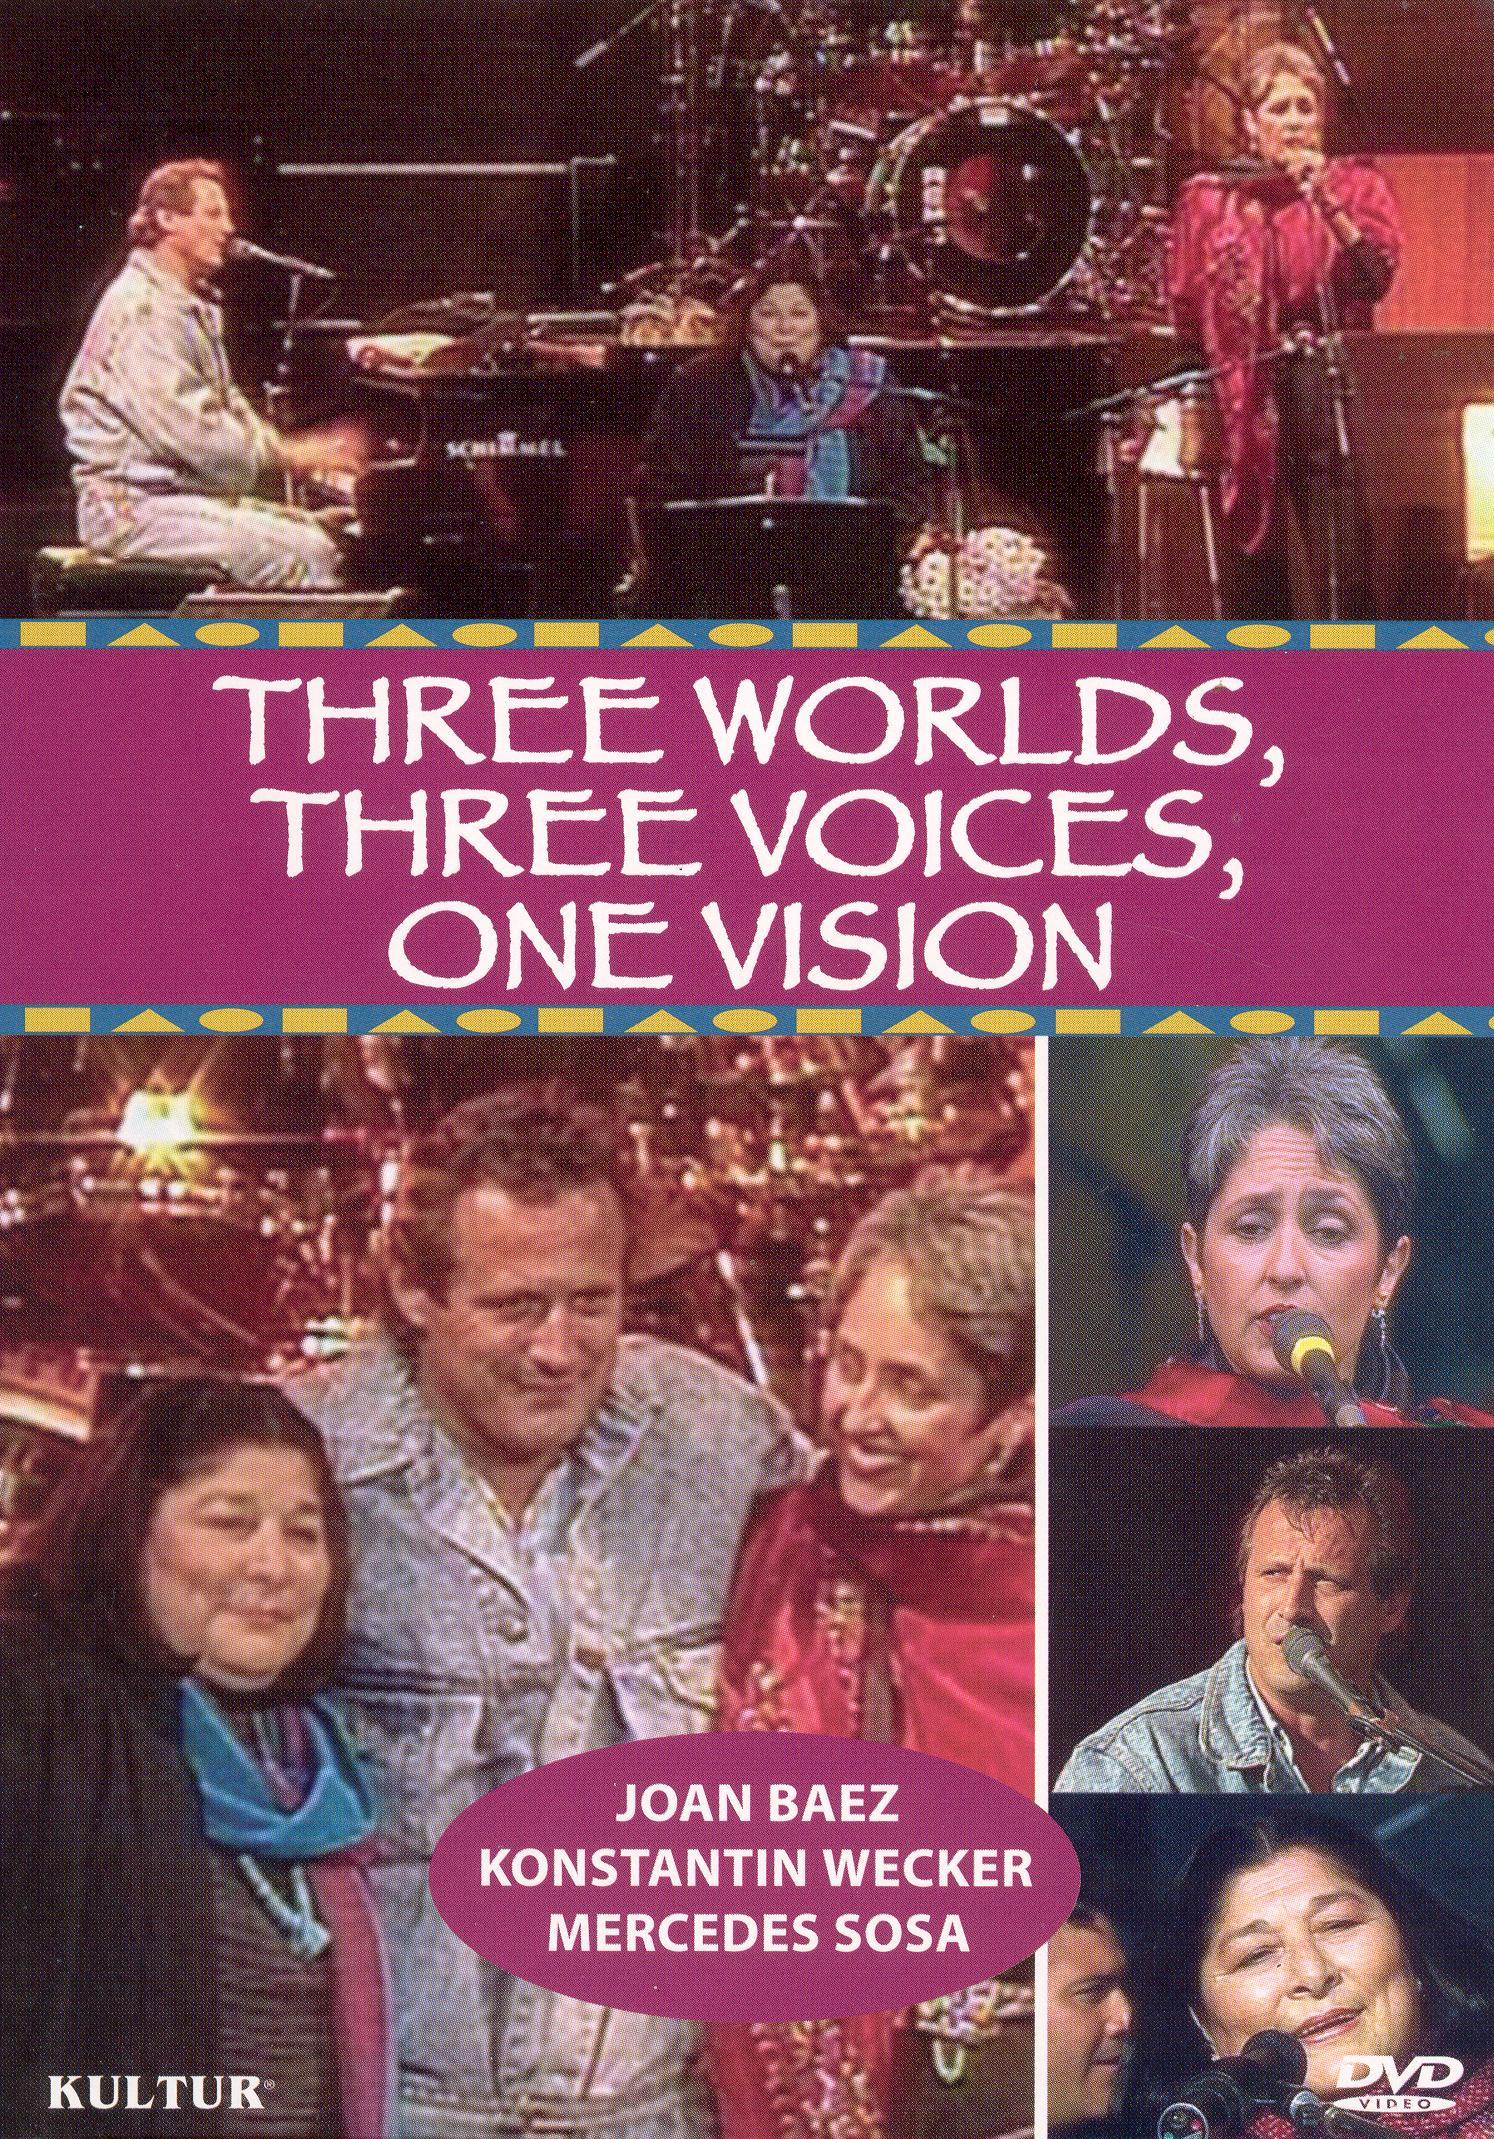 Joan Baez, Mercedes Sosa and Konstantin Wecker: Three Worlds, Three Voices, One Vision